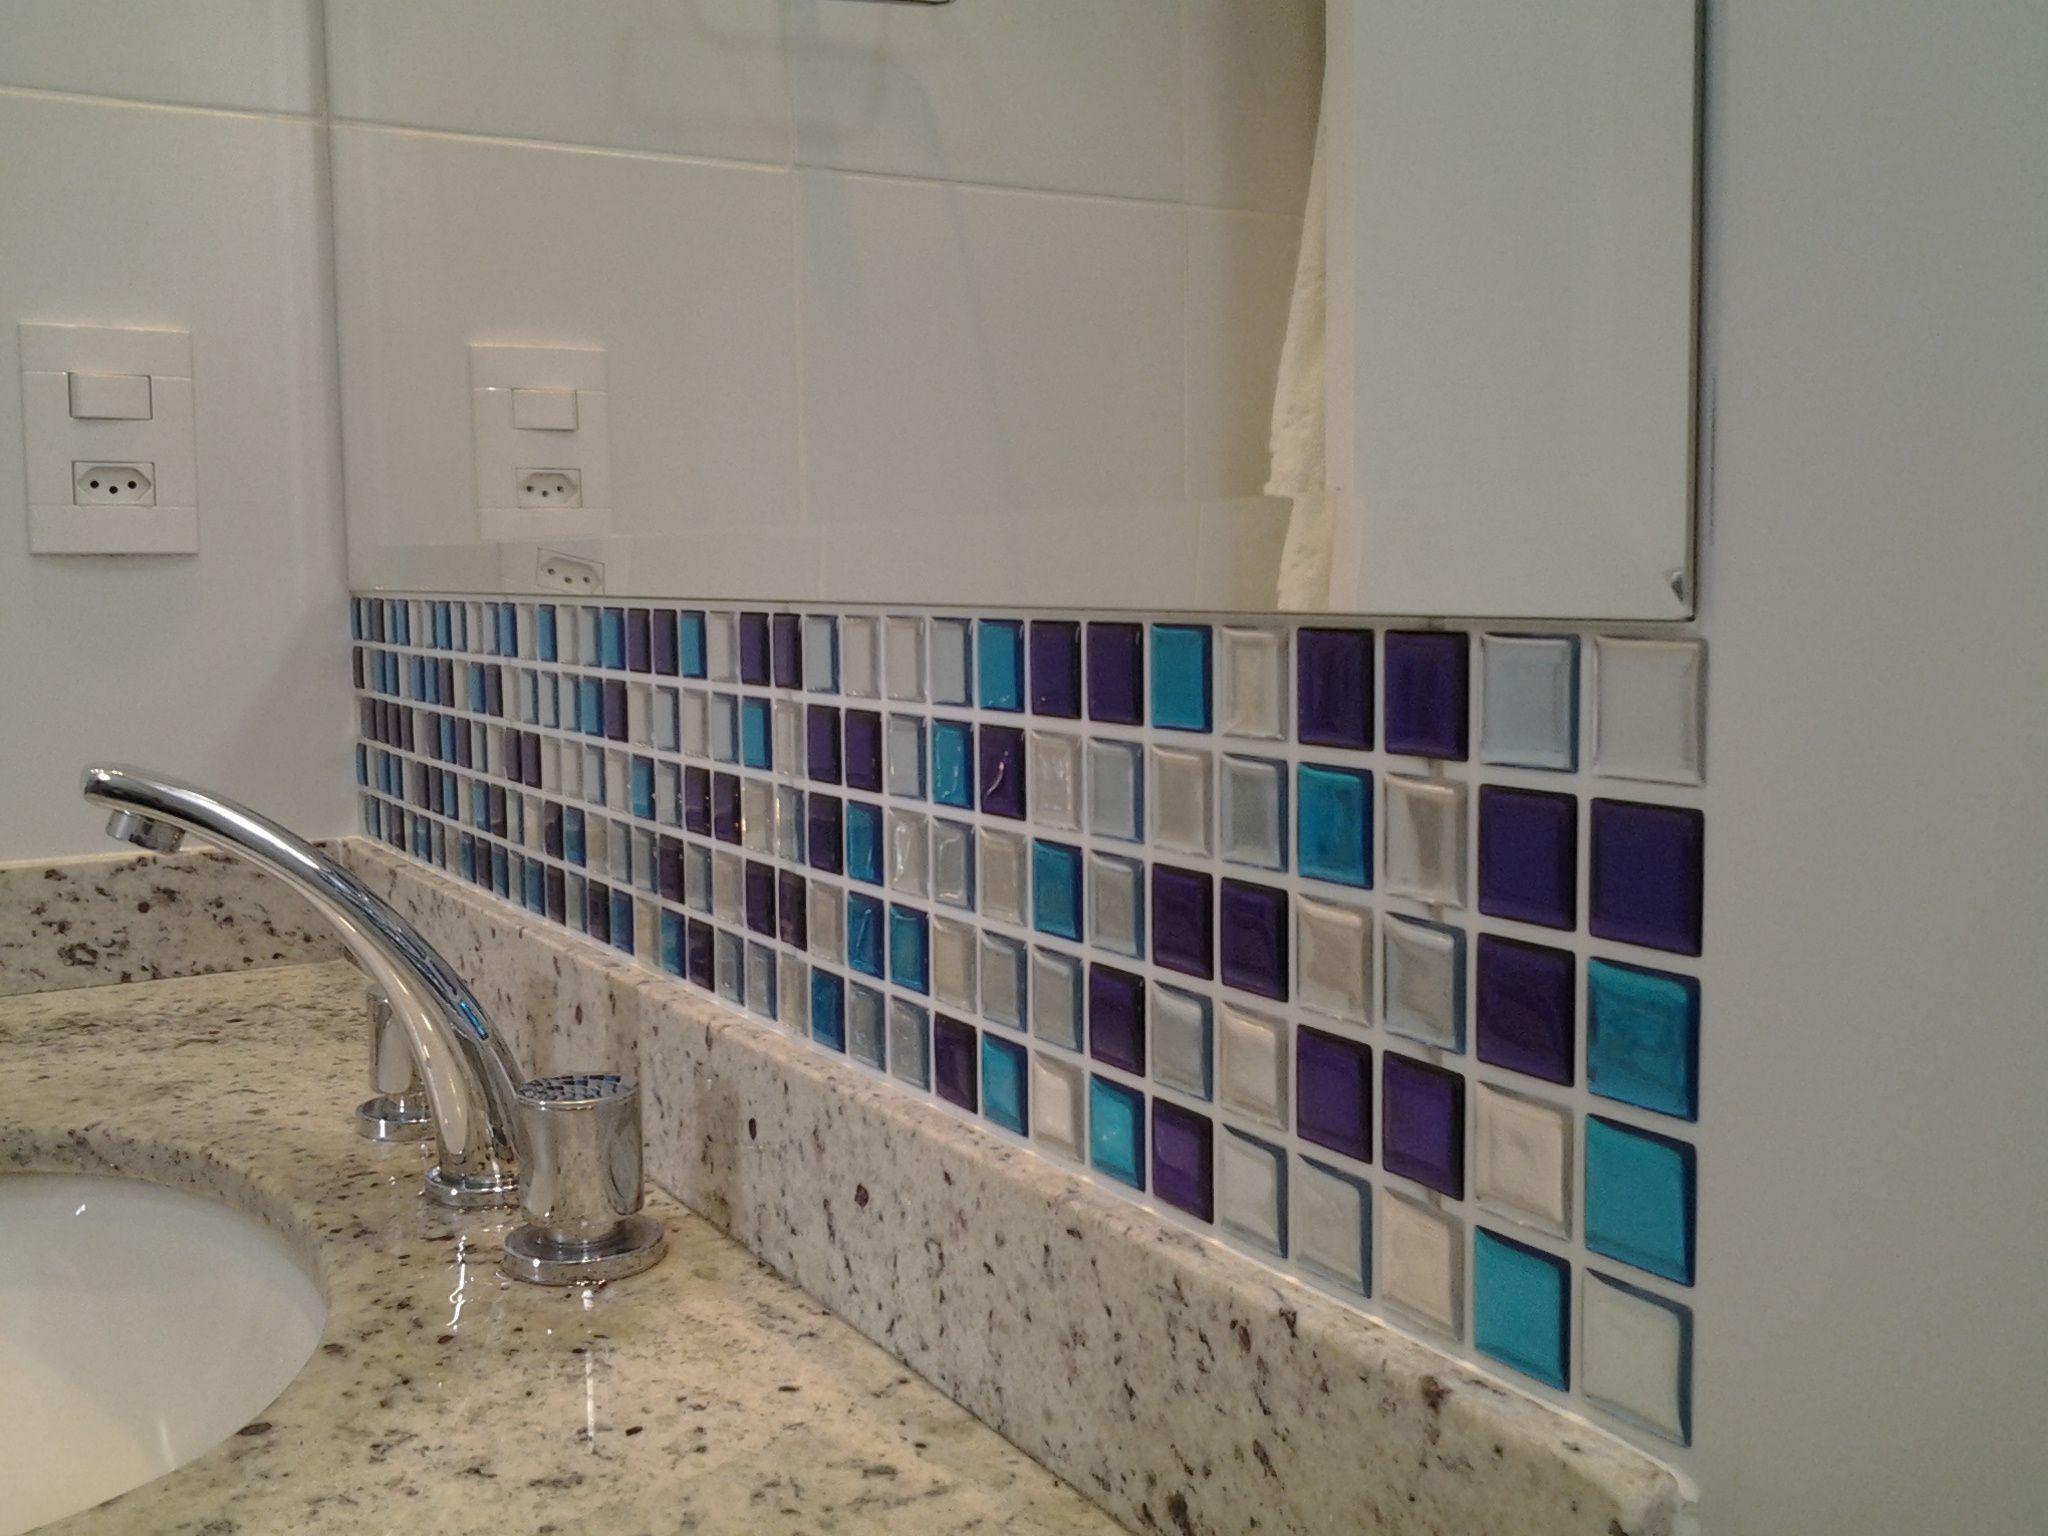 Pastilha Adesiva  Pastilha Adesiva Resinada  Pinterest -> Banheiro Decorado Com Pastilha Adesiva